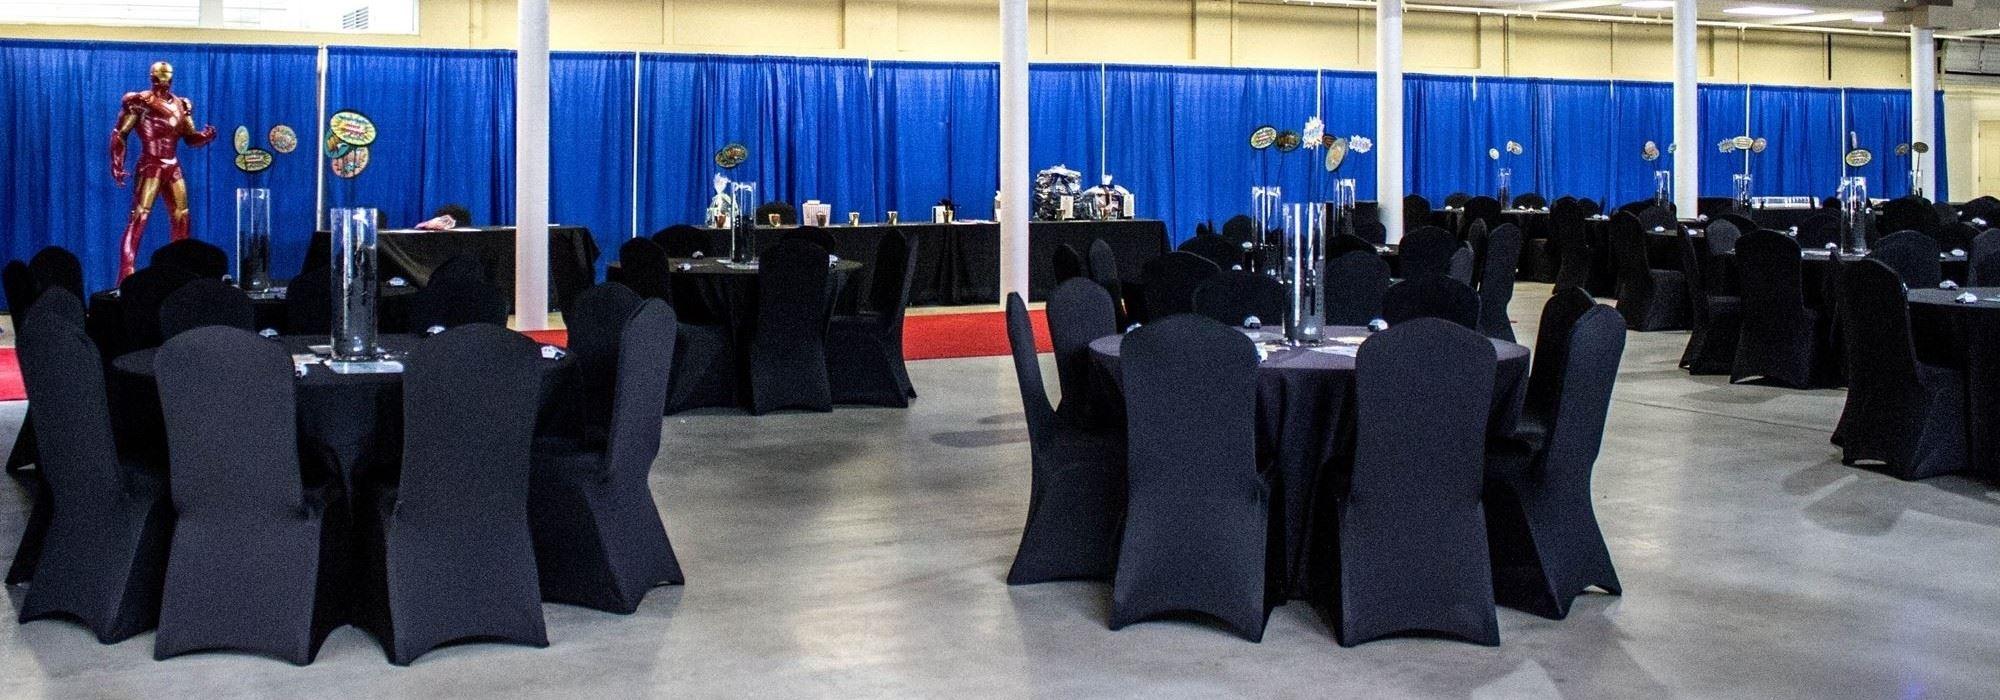 Expo Center At The South Florida Fairgrounds With Events South Florida Fair Grounds